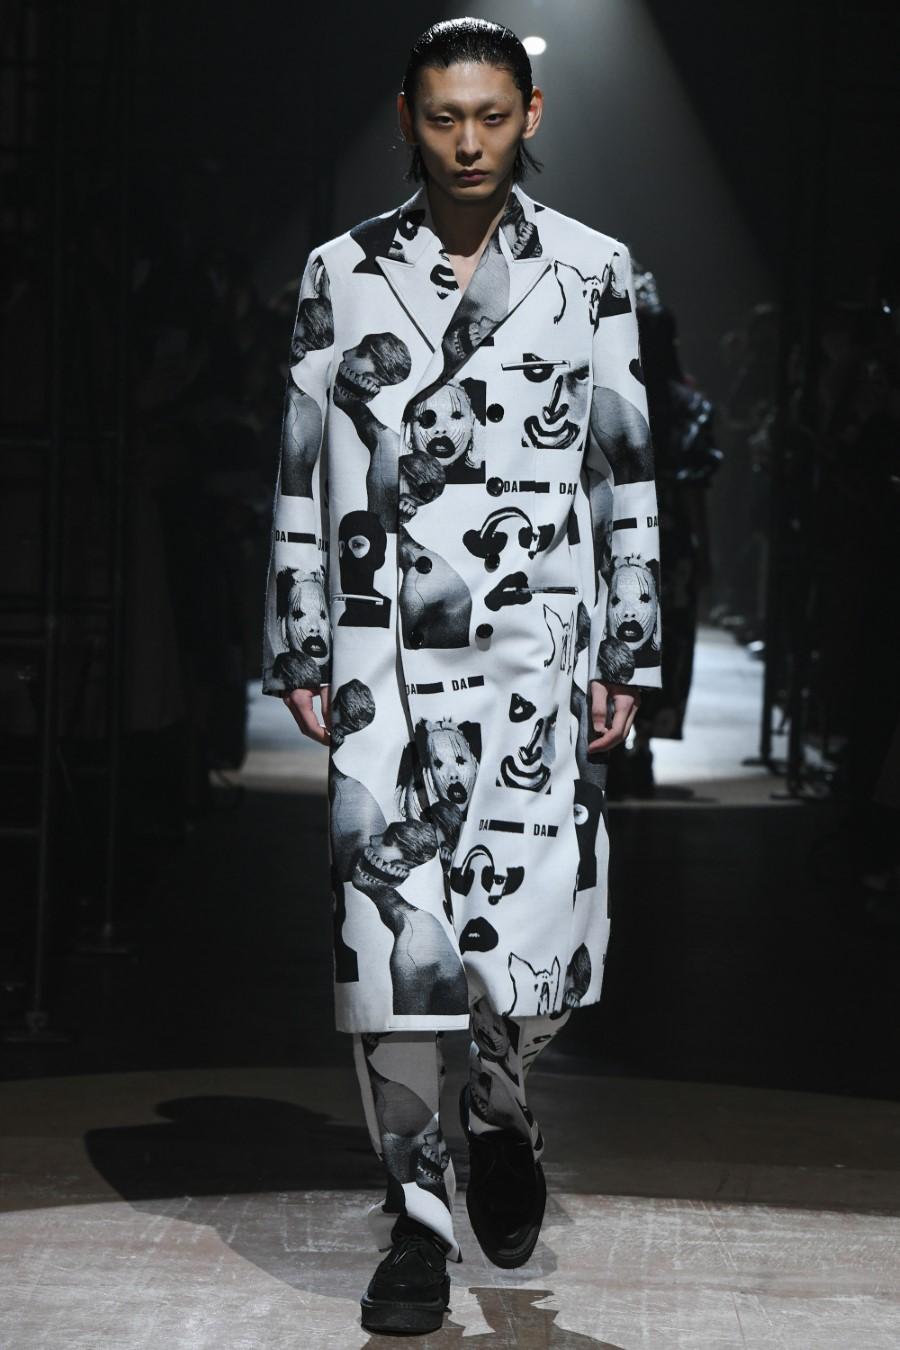 KIDILL Fall Winter 2021 - Paris Fashion Week Men's